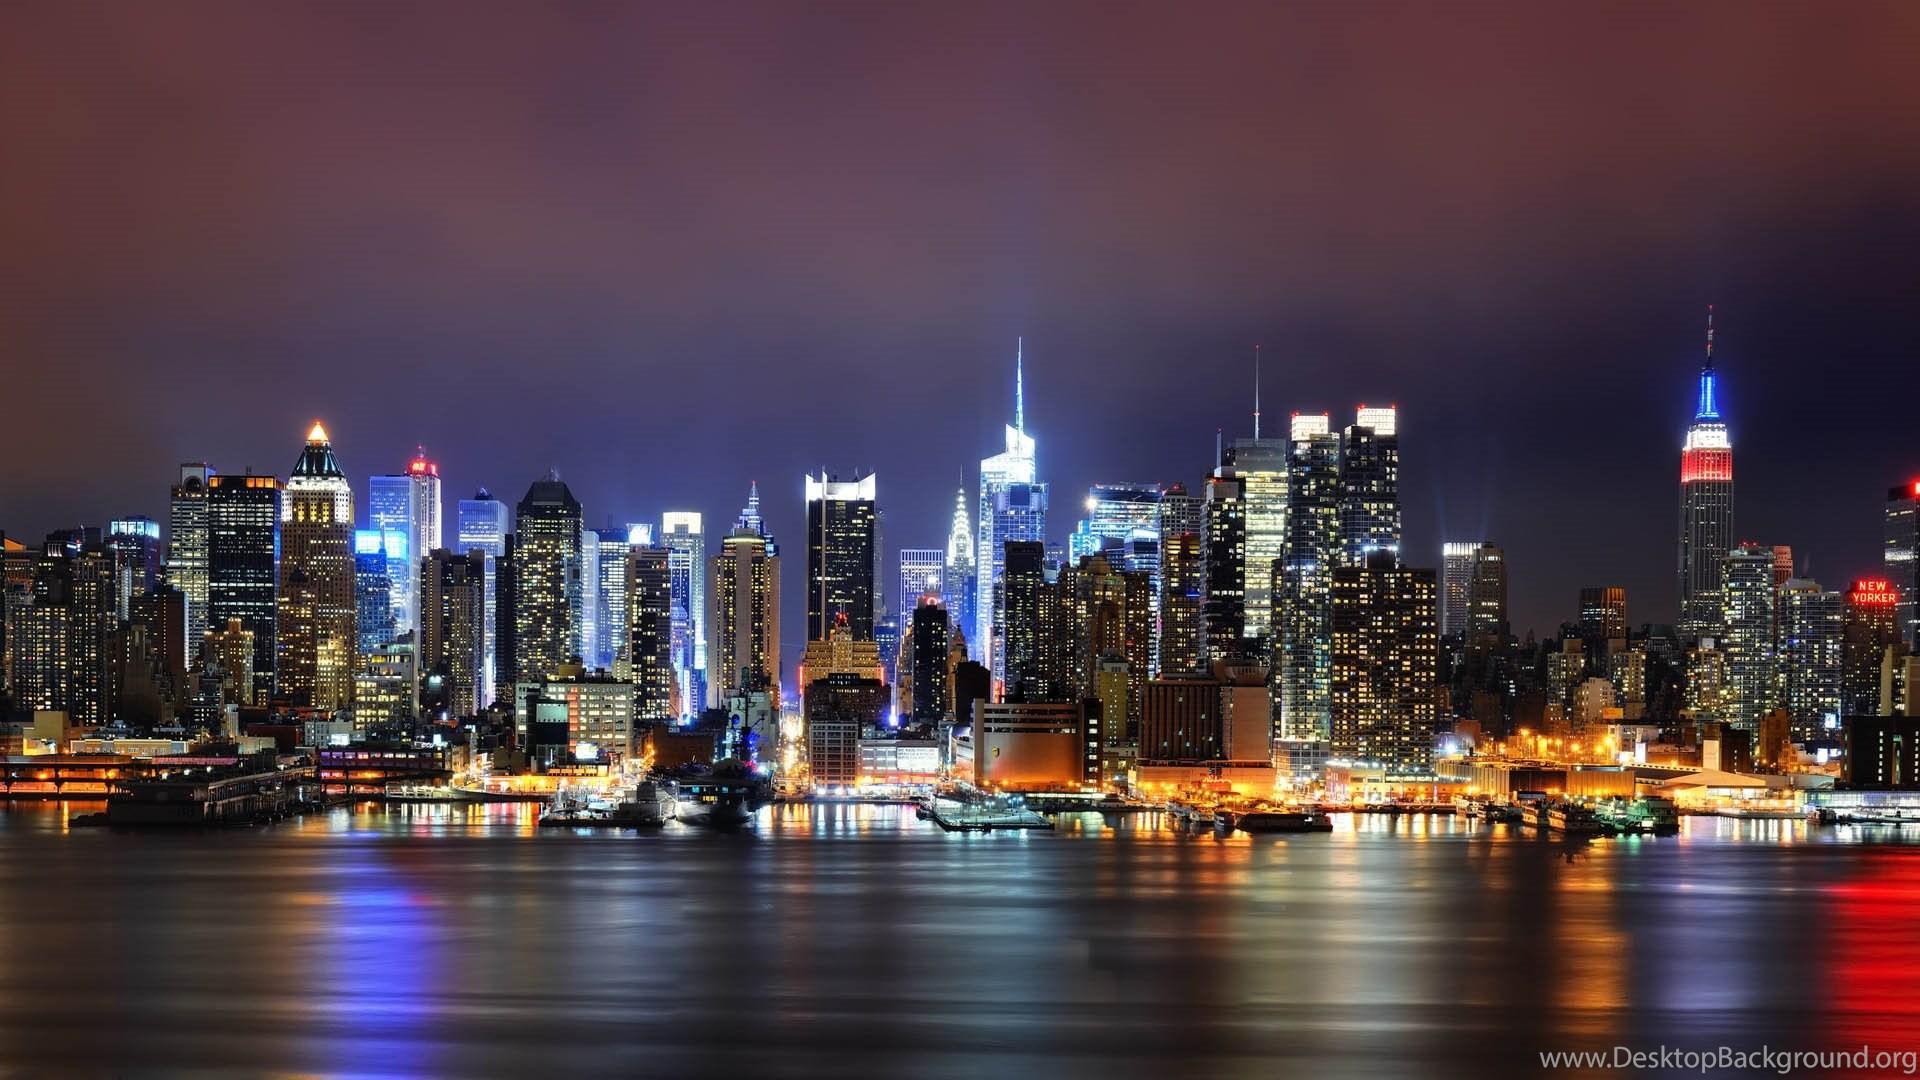 City New York City Desktop Background Wallpaper 1080p Hd Image Desktop Background